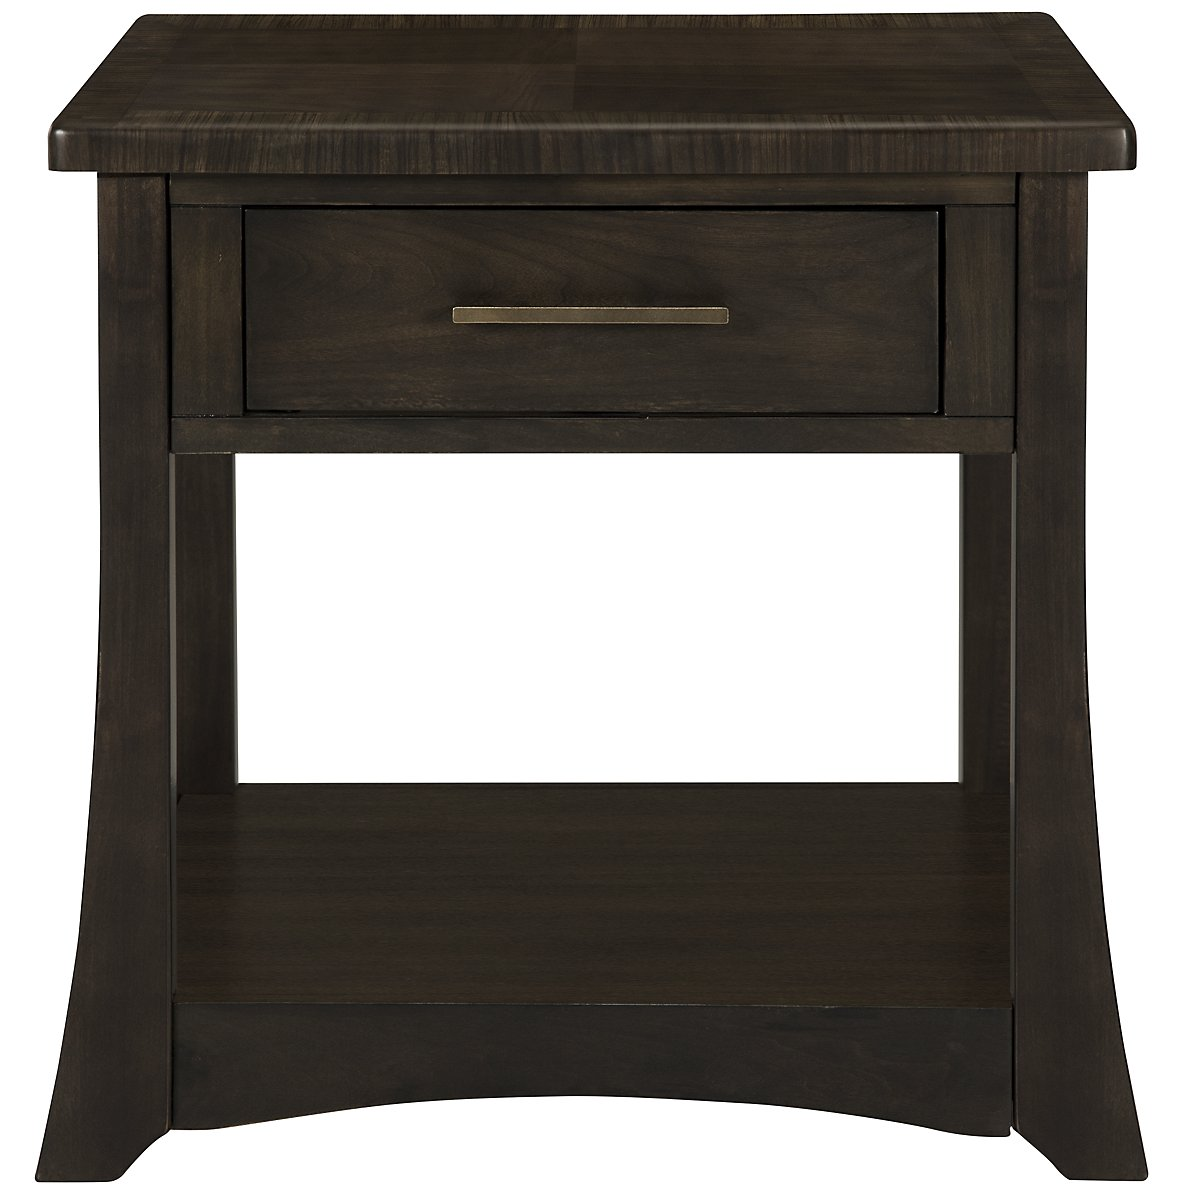 Milan Dark Tone Storage End Table